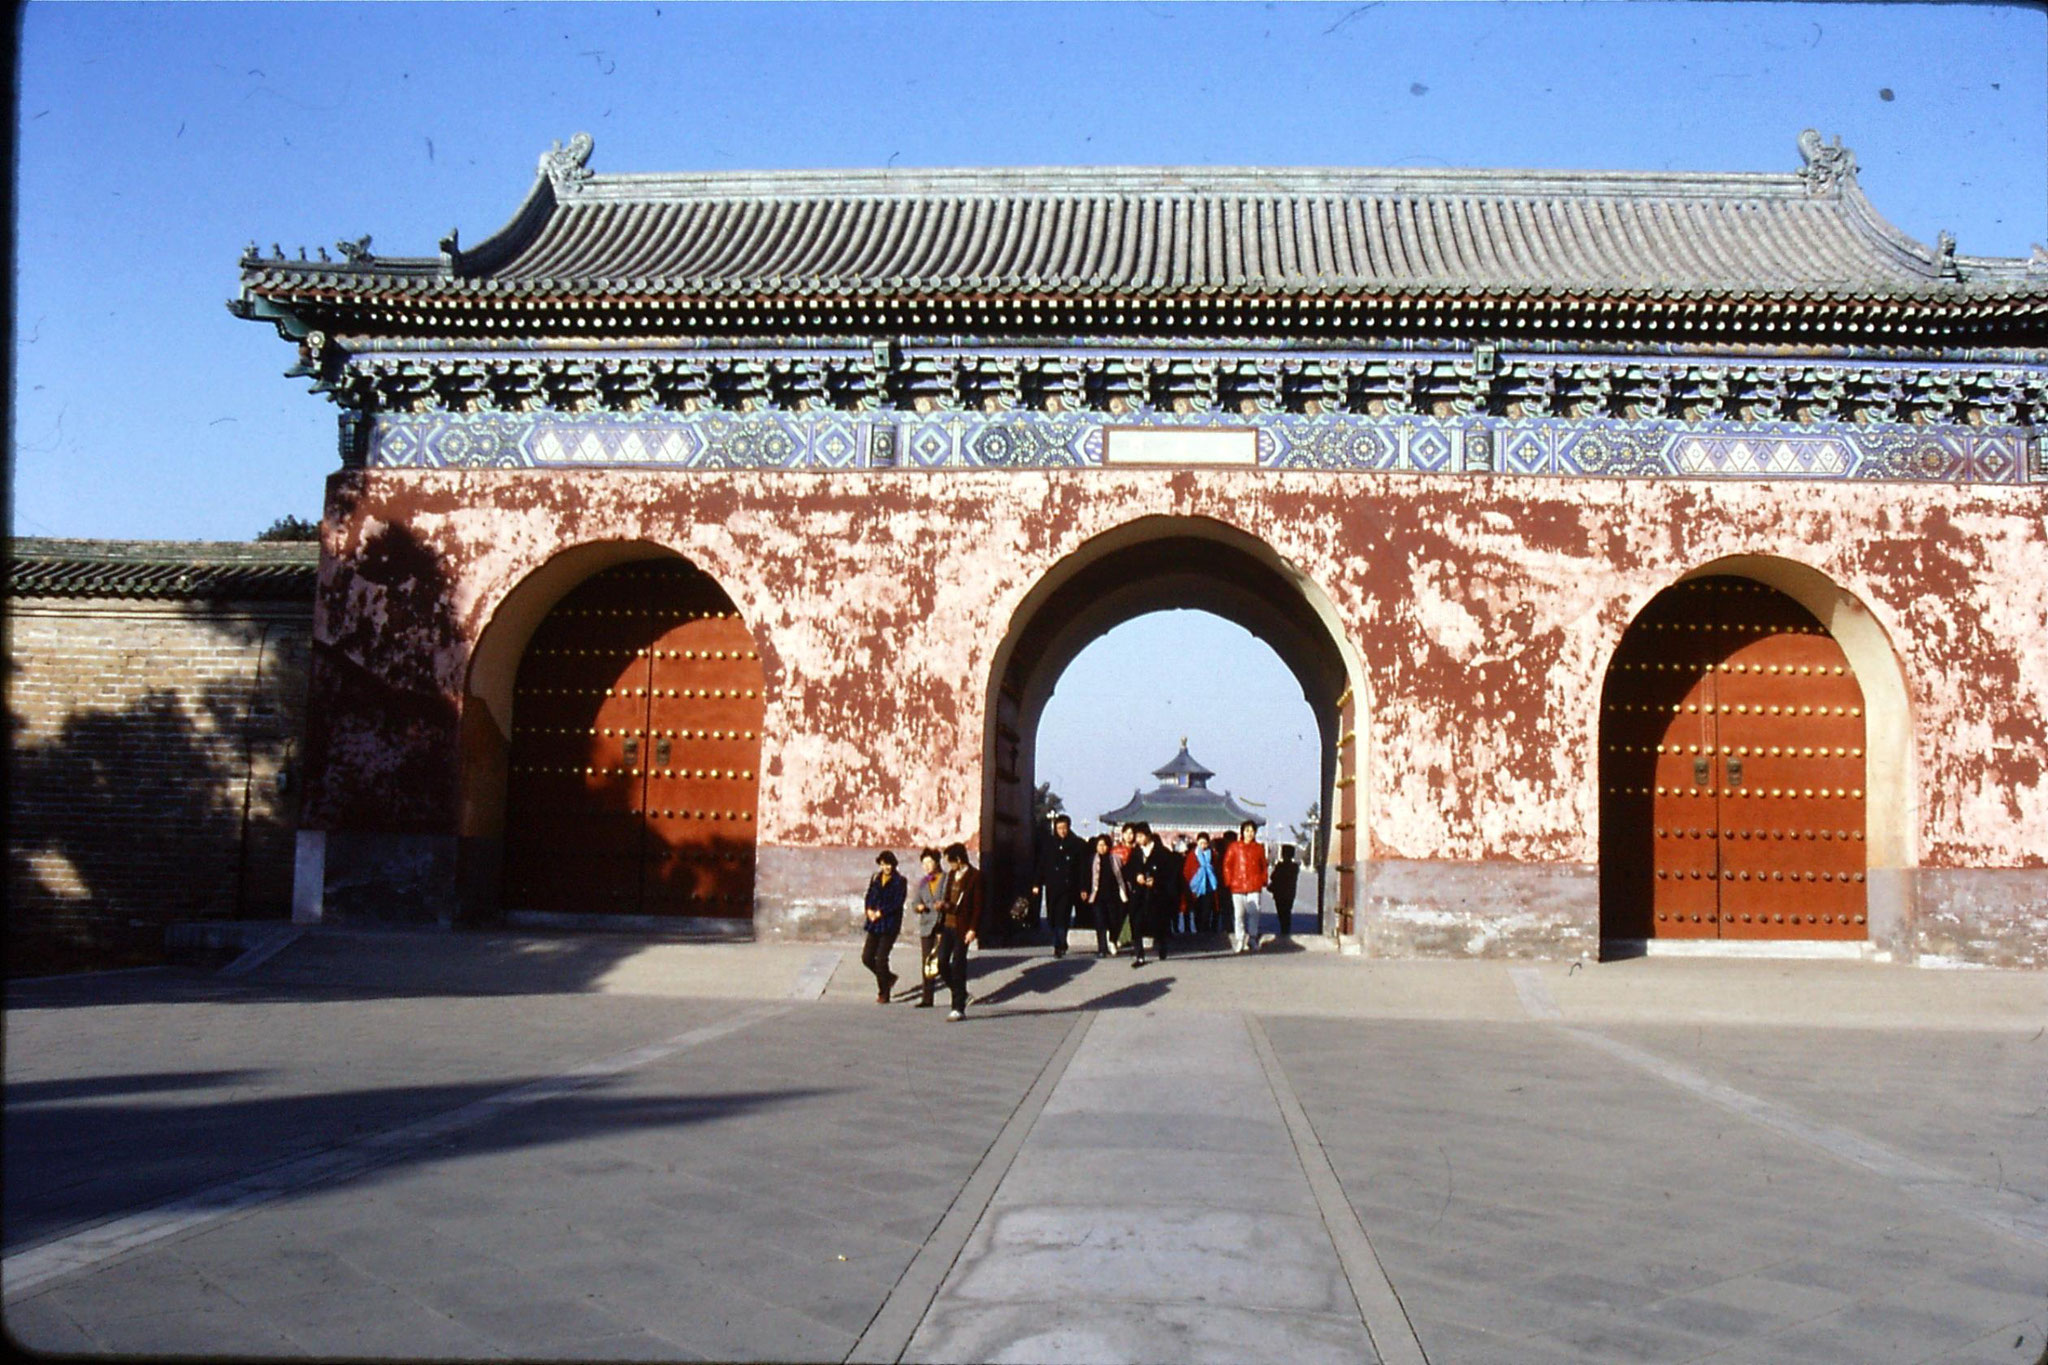 2/12/1988: 20: Tiantan Park